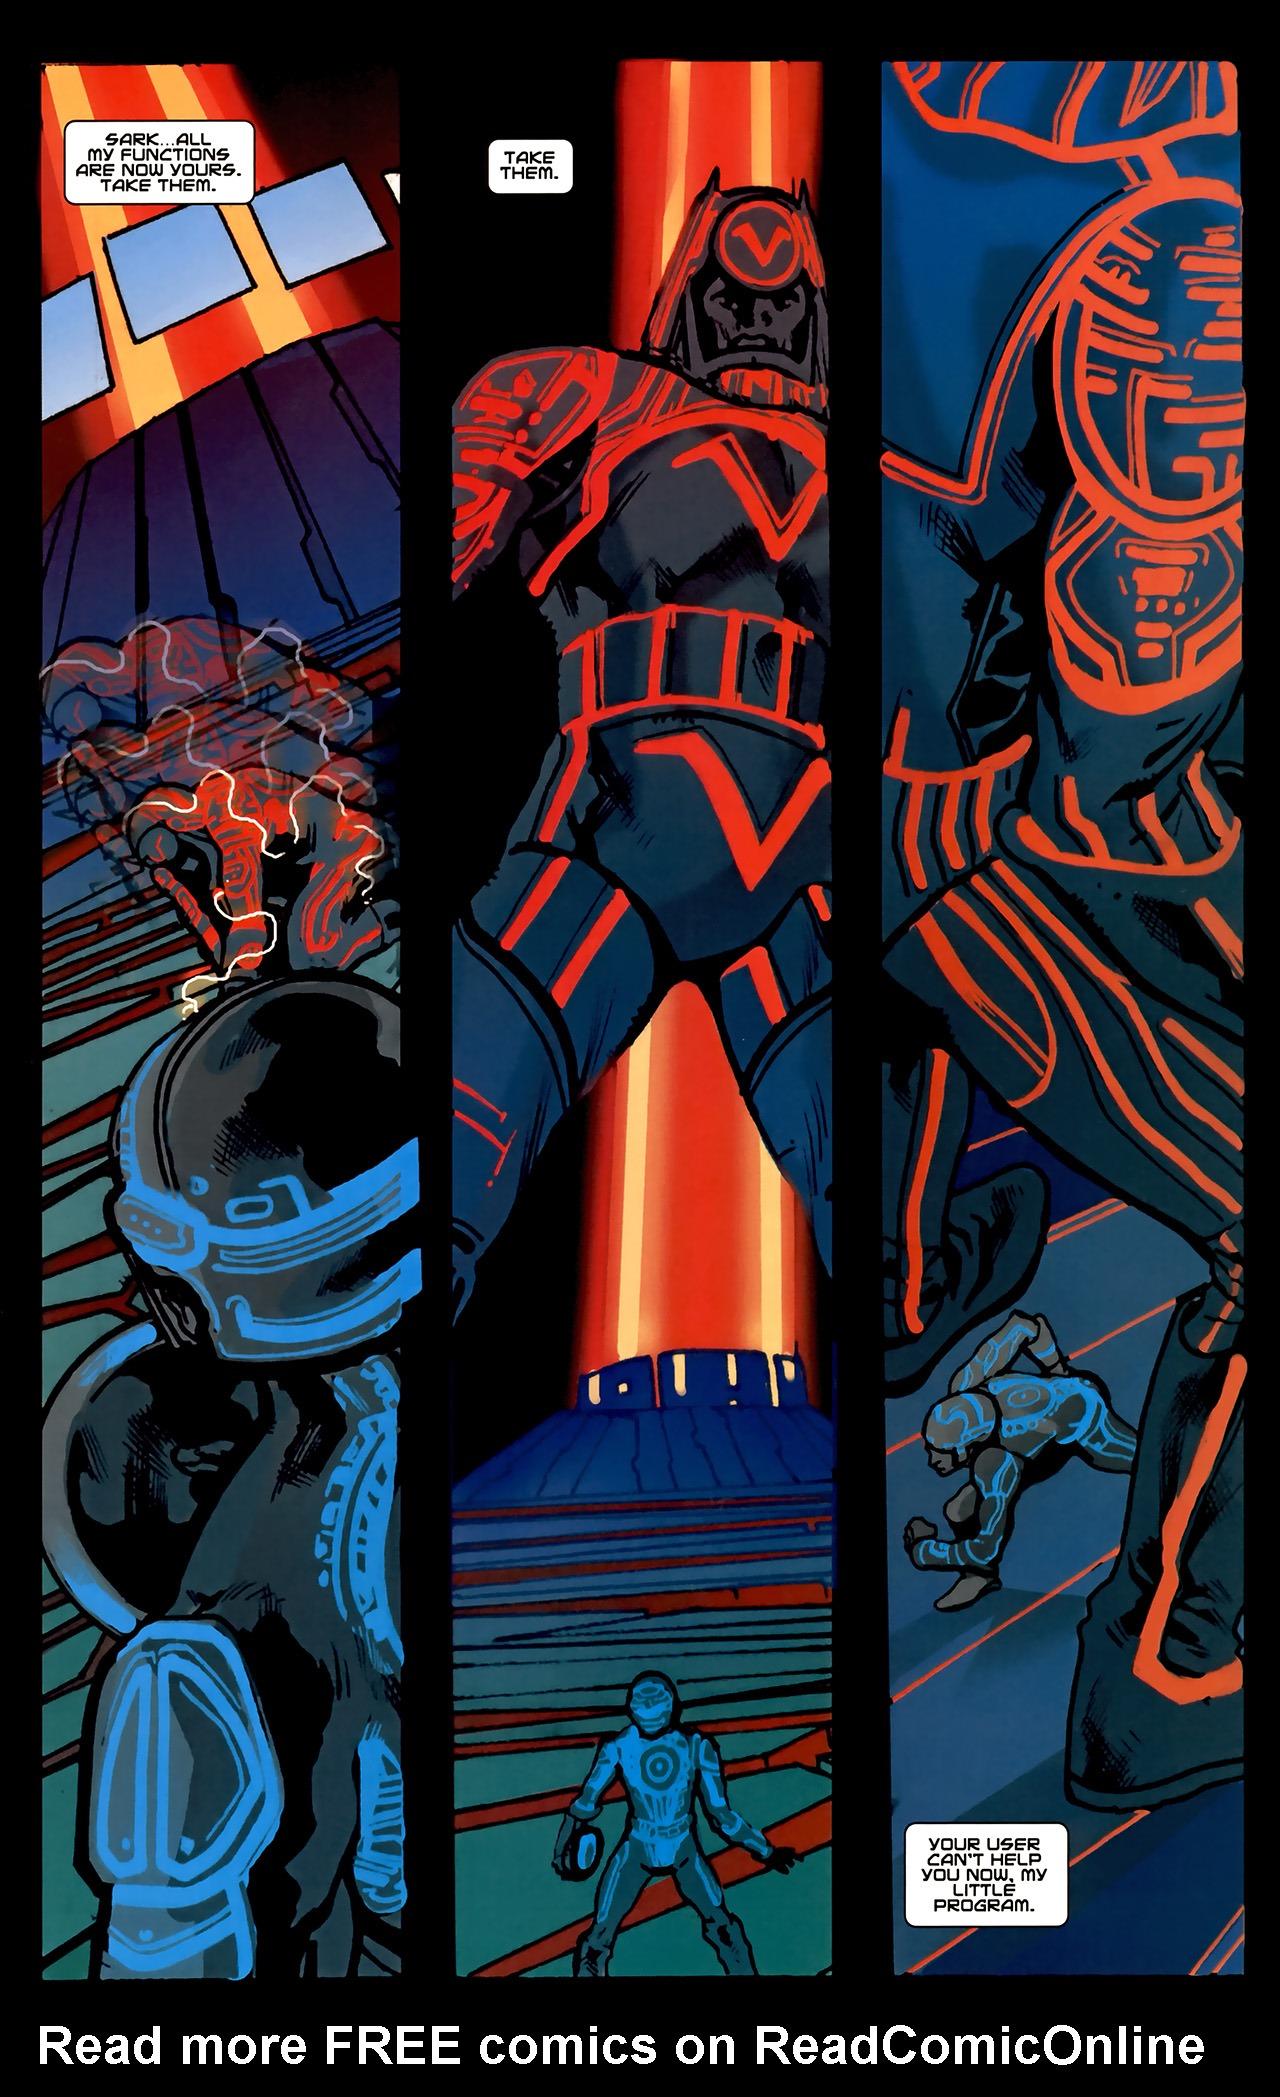 Read online TRON: Original Movie Adaptation comic -  Issue #2 - 30